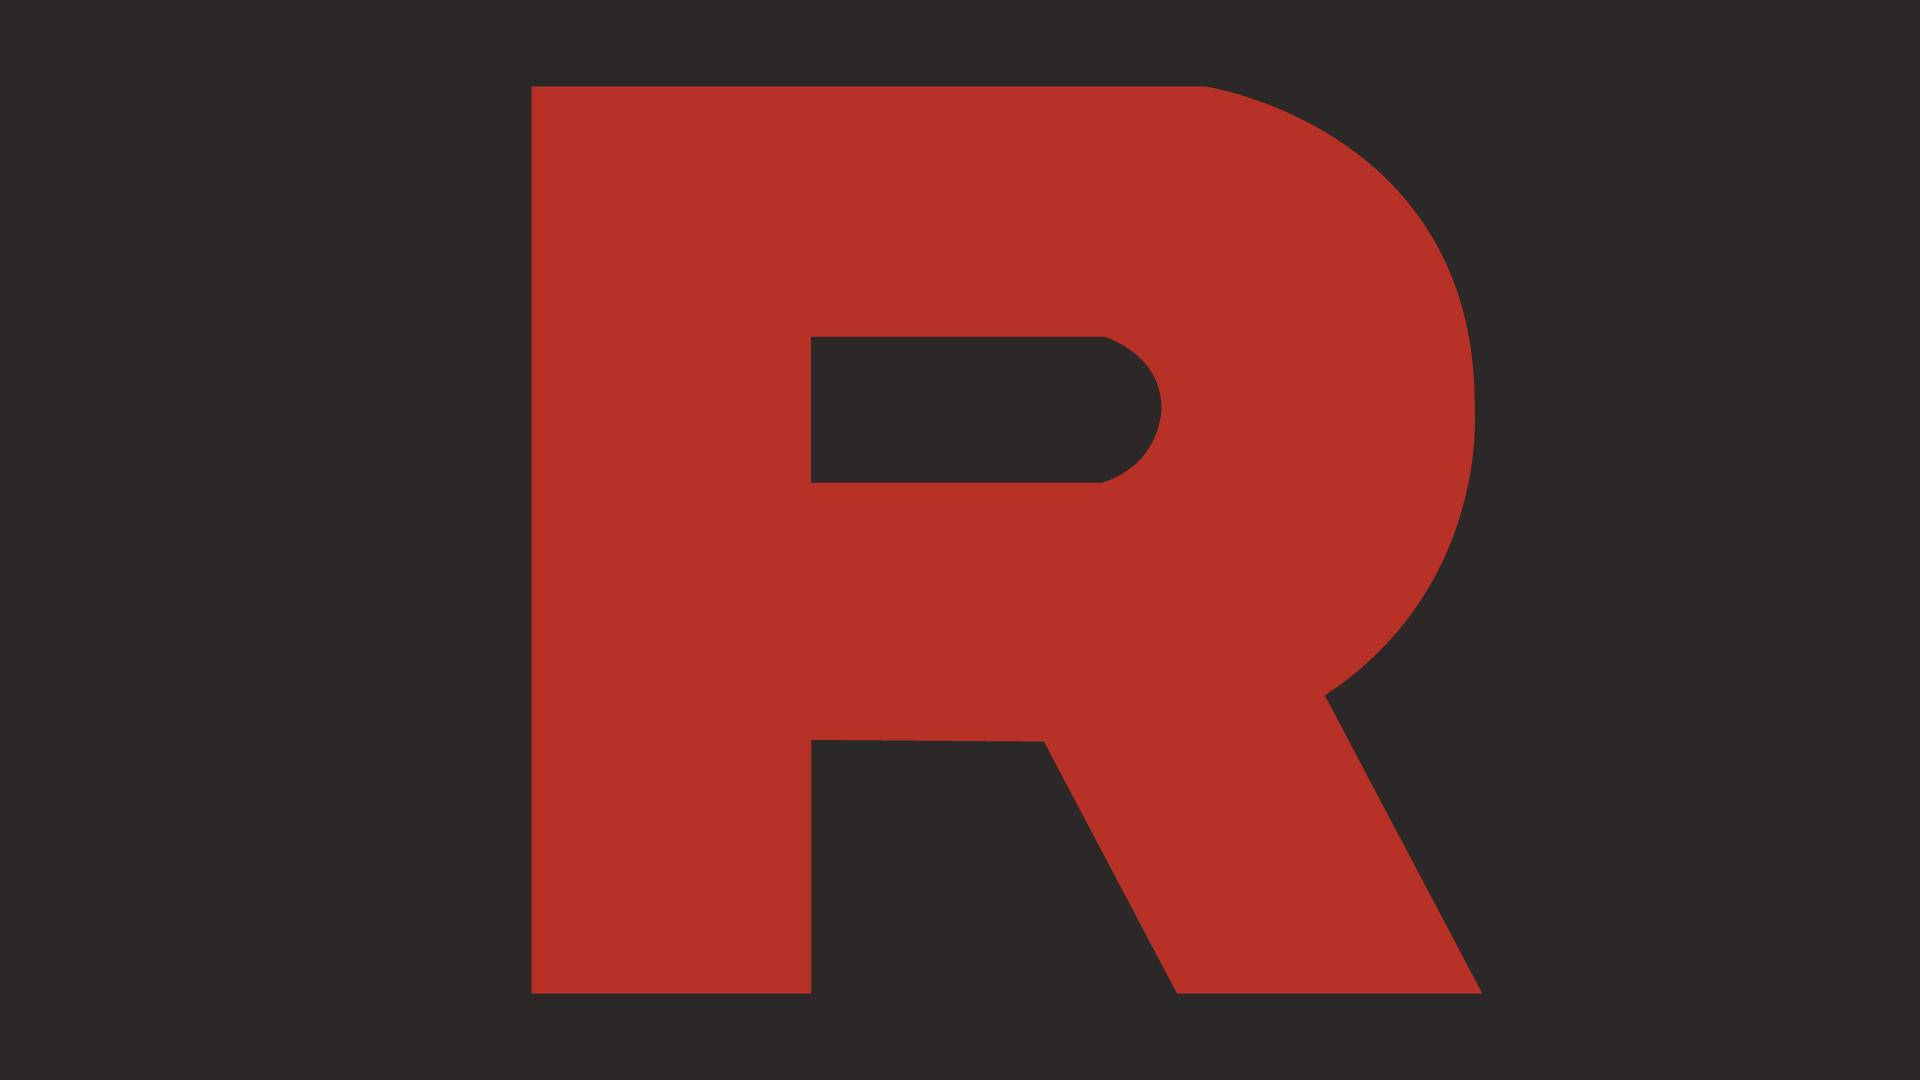 Wallpaper Pokemon Team Rocket Logo 1920x1080 Dokkar 1265271